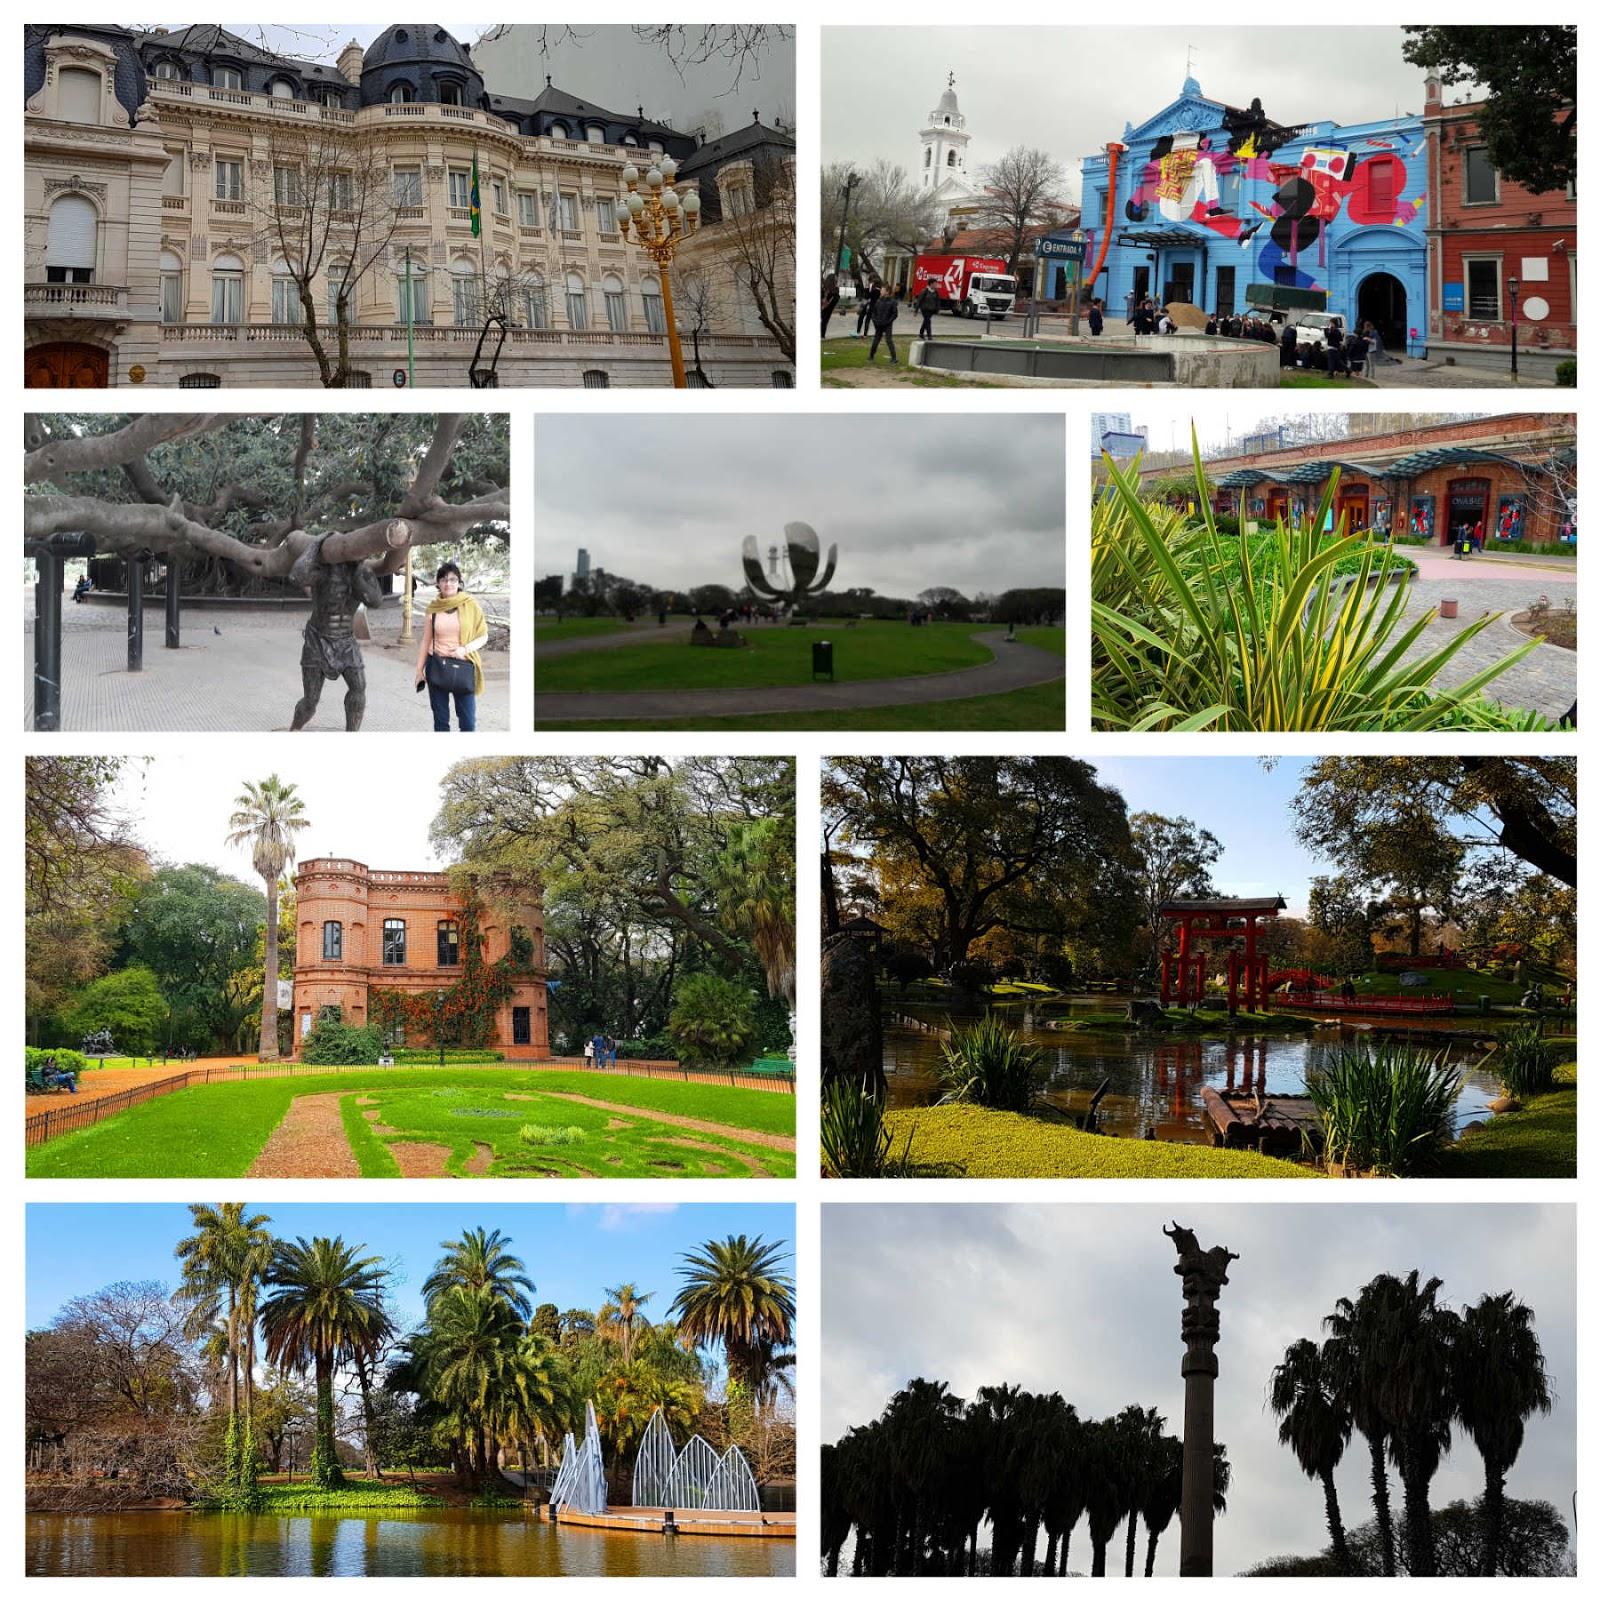 Embaixada do Brasil, Recoleta, Tree Heritage,Floralis Genérica, Arcos Distrito, Jardim Botânico, Jardim Japonês, Bosques de Palermo, Coluna Persa.